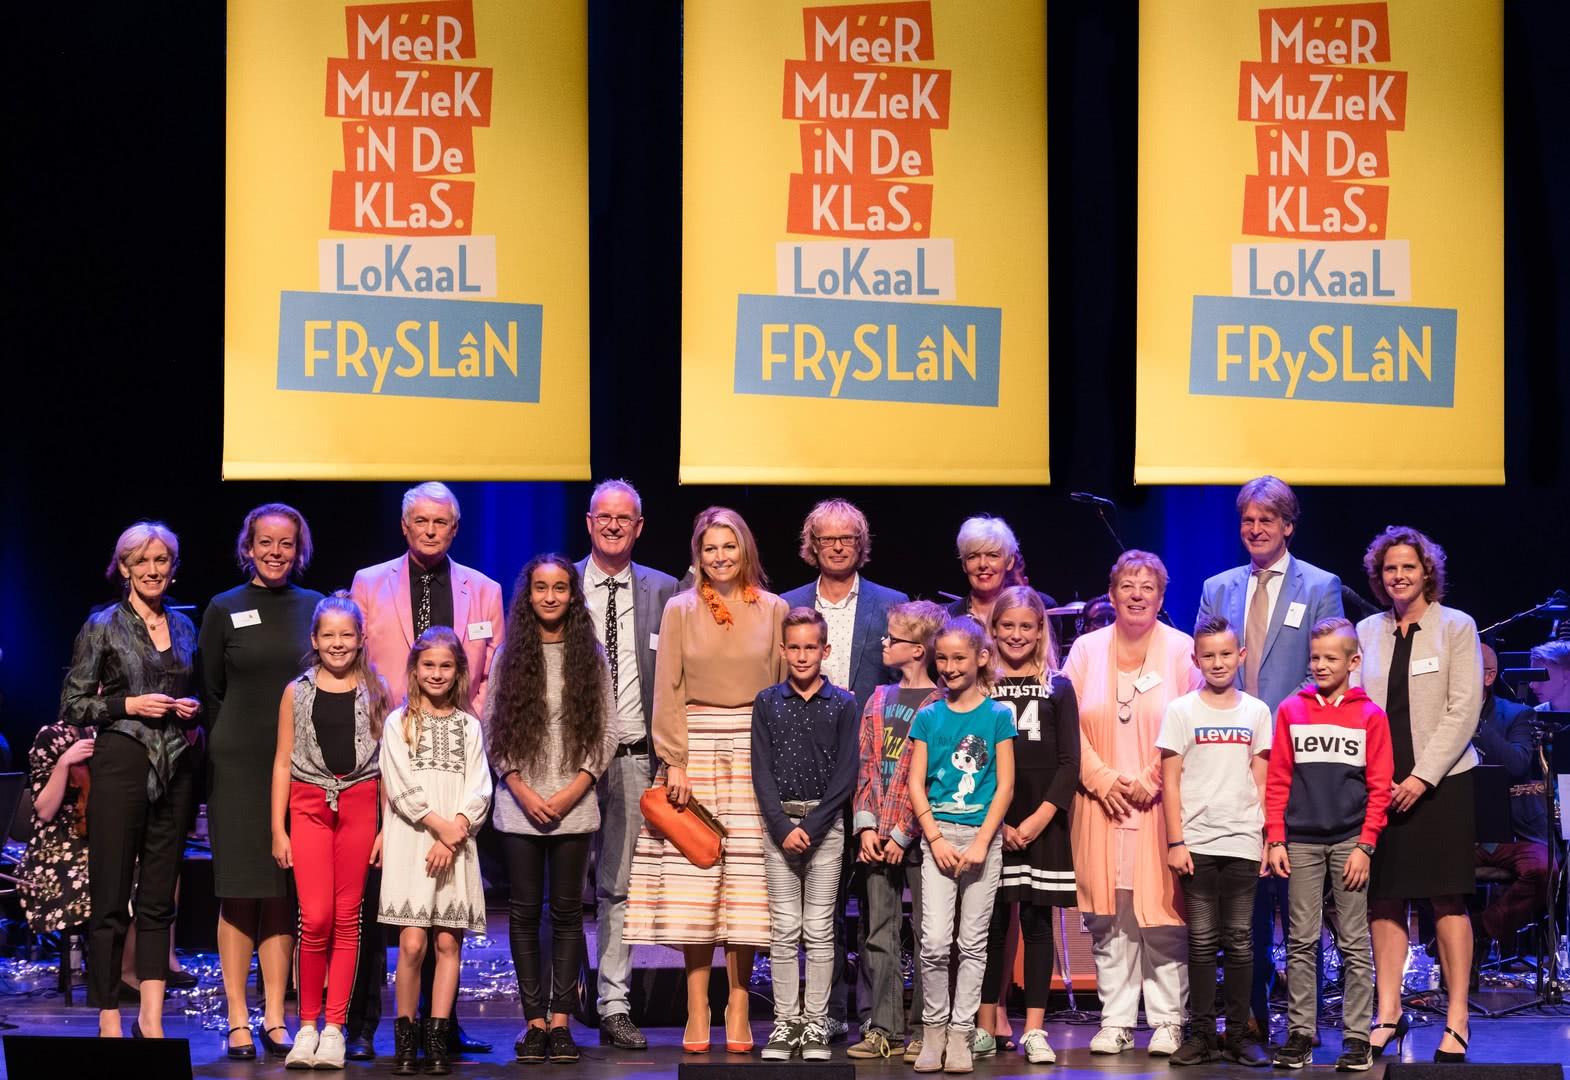 Méér muziek in de klas lokaal Fryslân